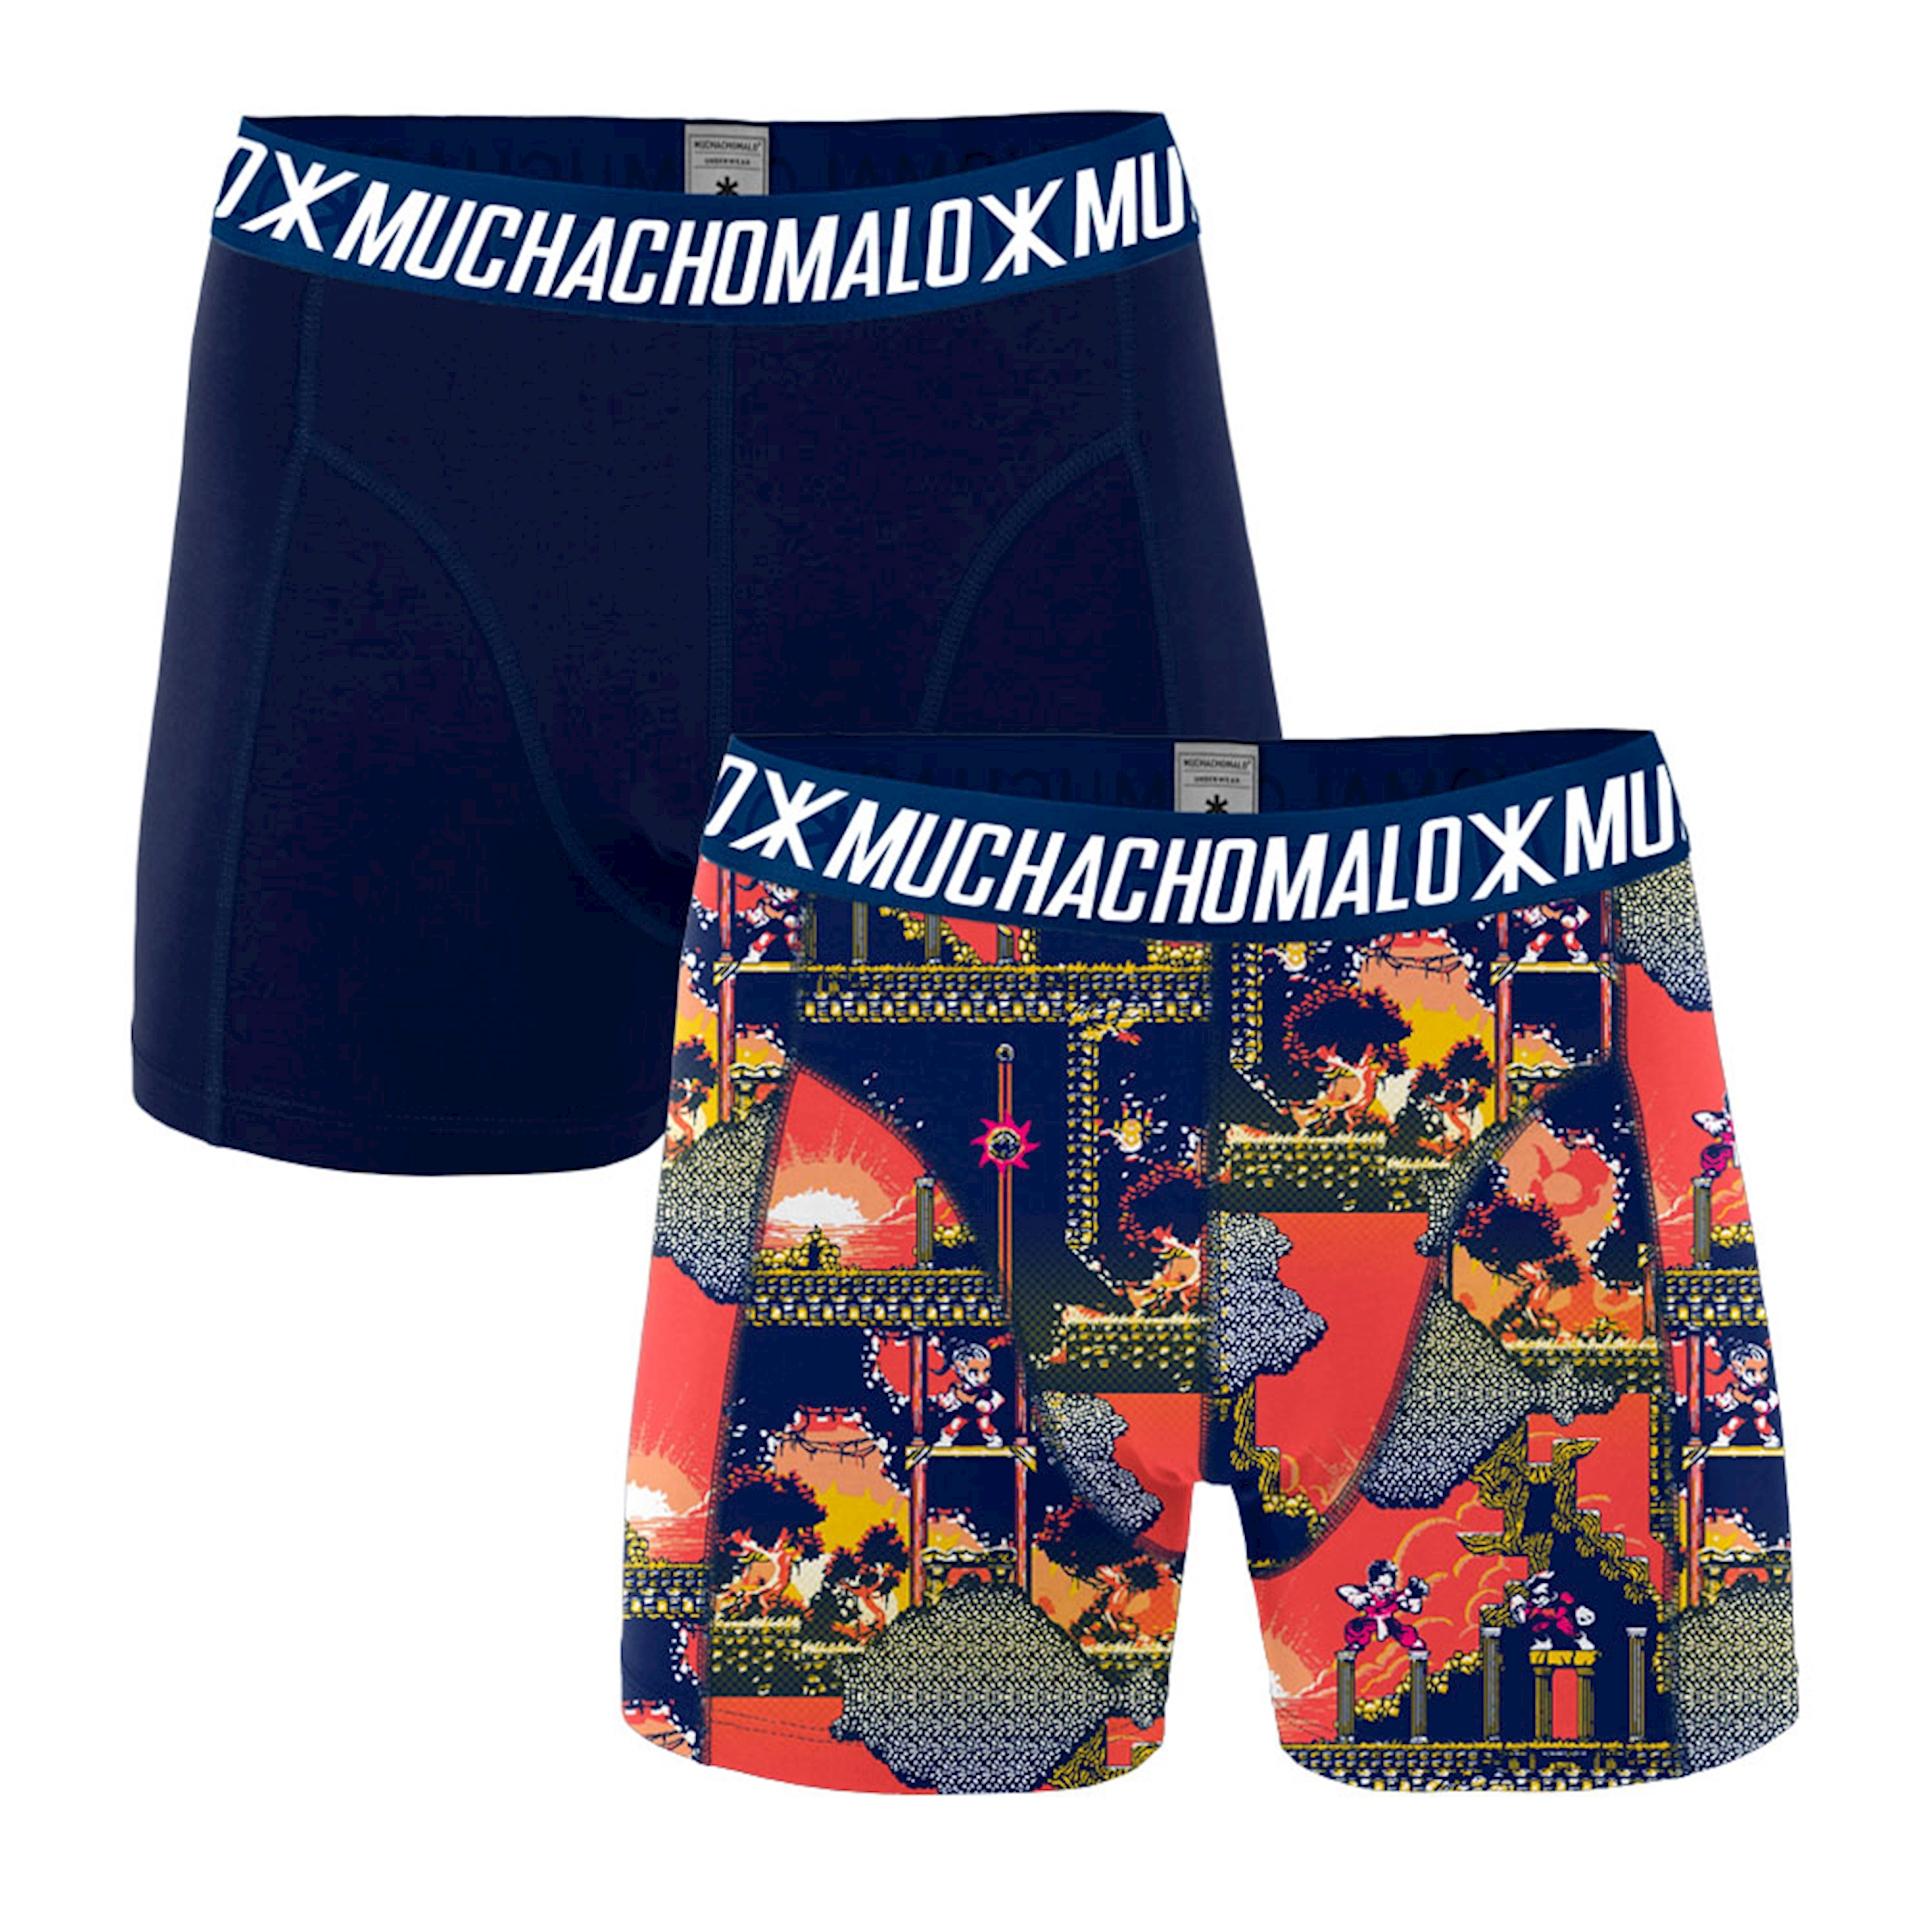 Muchachomalo boxershorts Super Nintendo 2-pack-XL